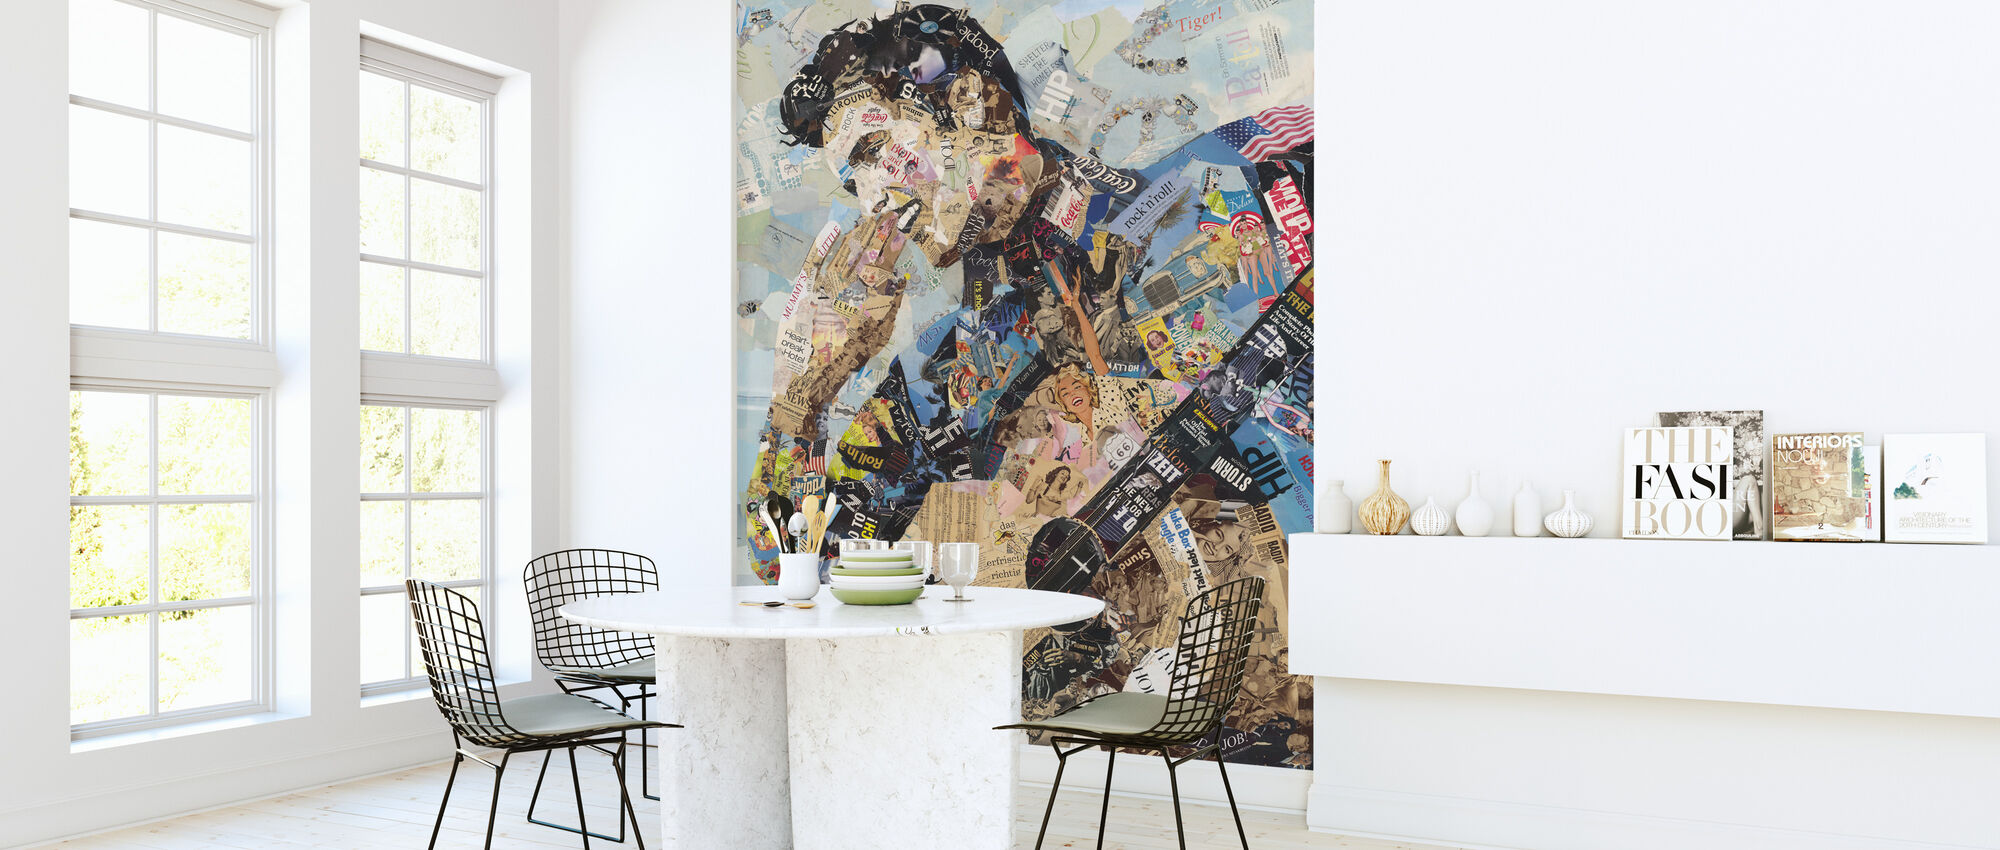 All Shook Up - Wallpaper - Kitchen